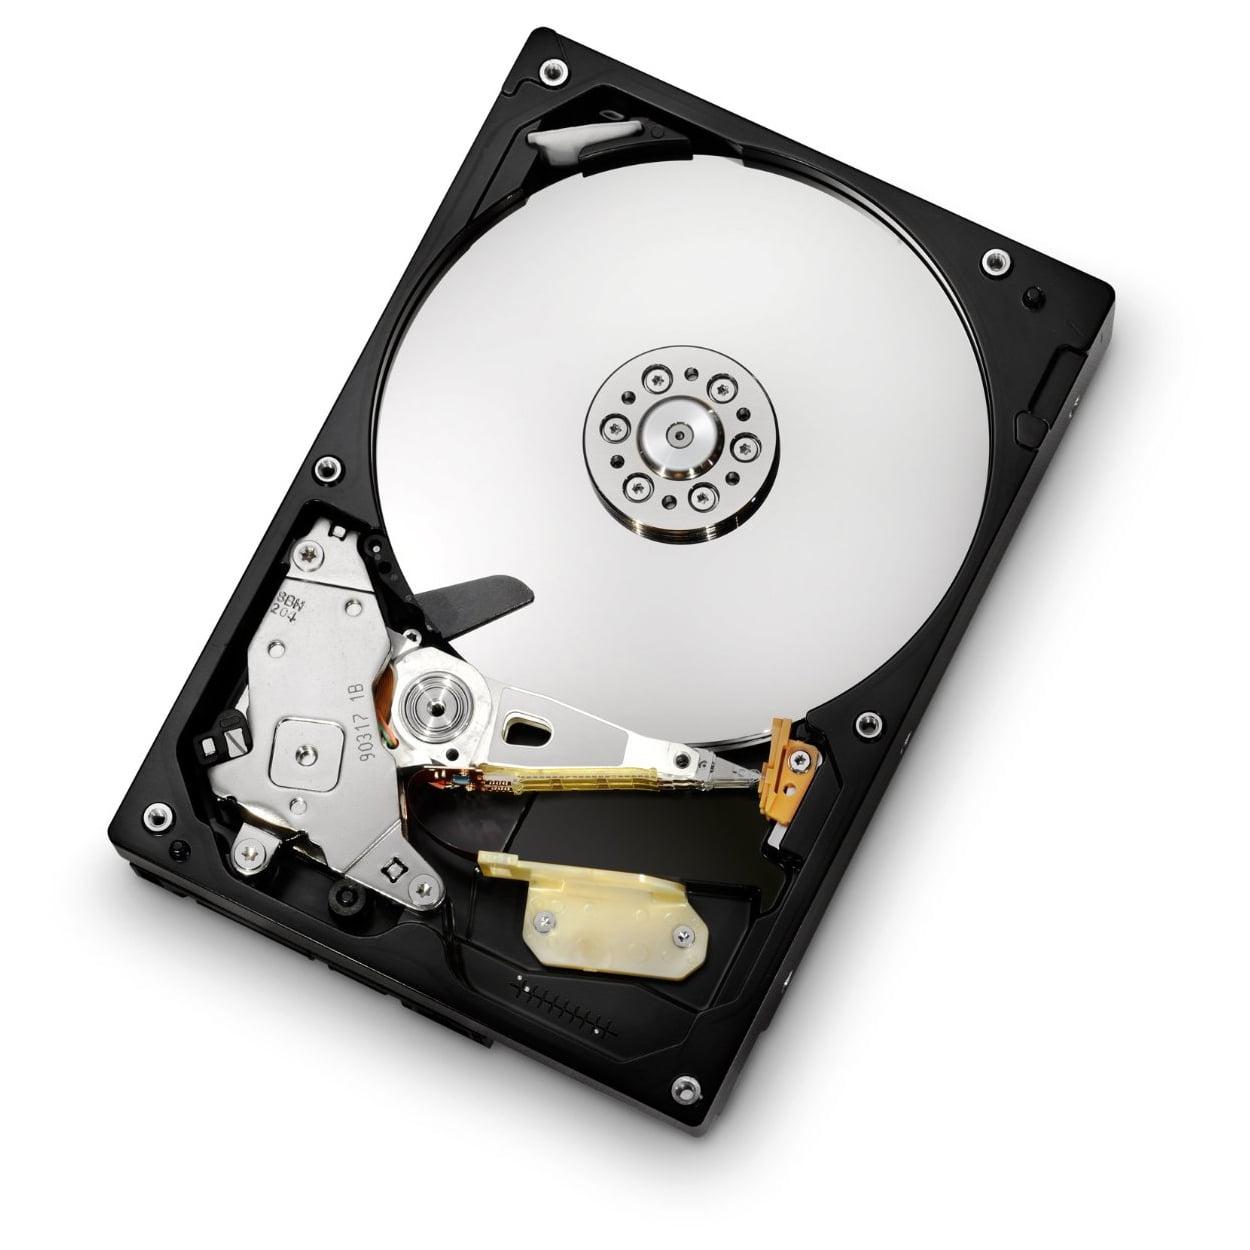 Refurbished Hitachi Deskstar 1TB Internal Hard Dirve 7200RPM SATA/300 32MB - E7K1000